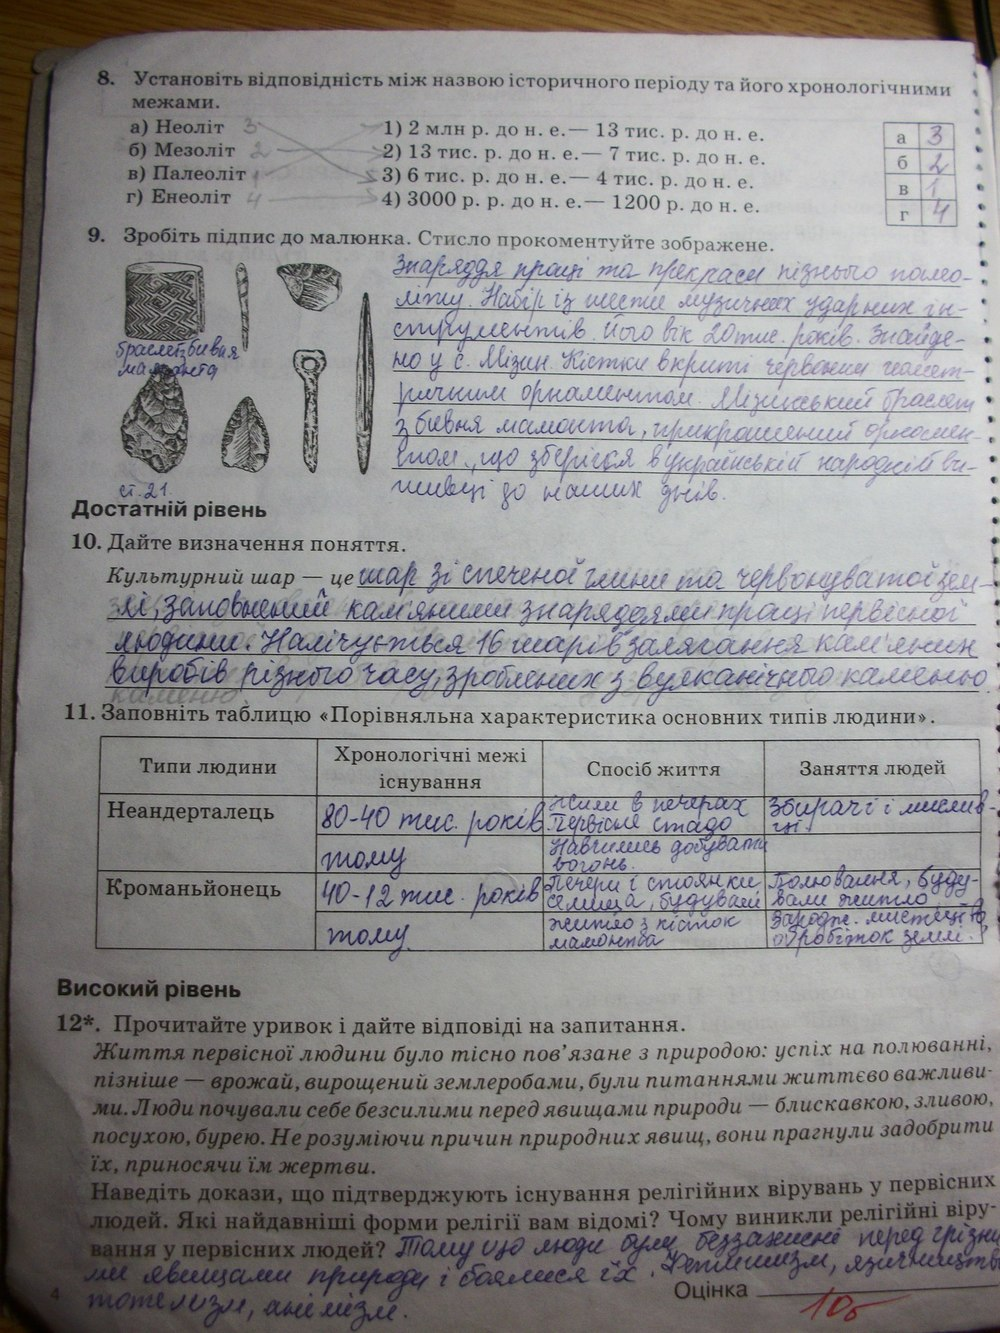 ГДЗ рабочие тетради 6 класс. Задание: стр. 4